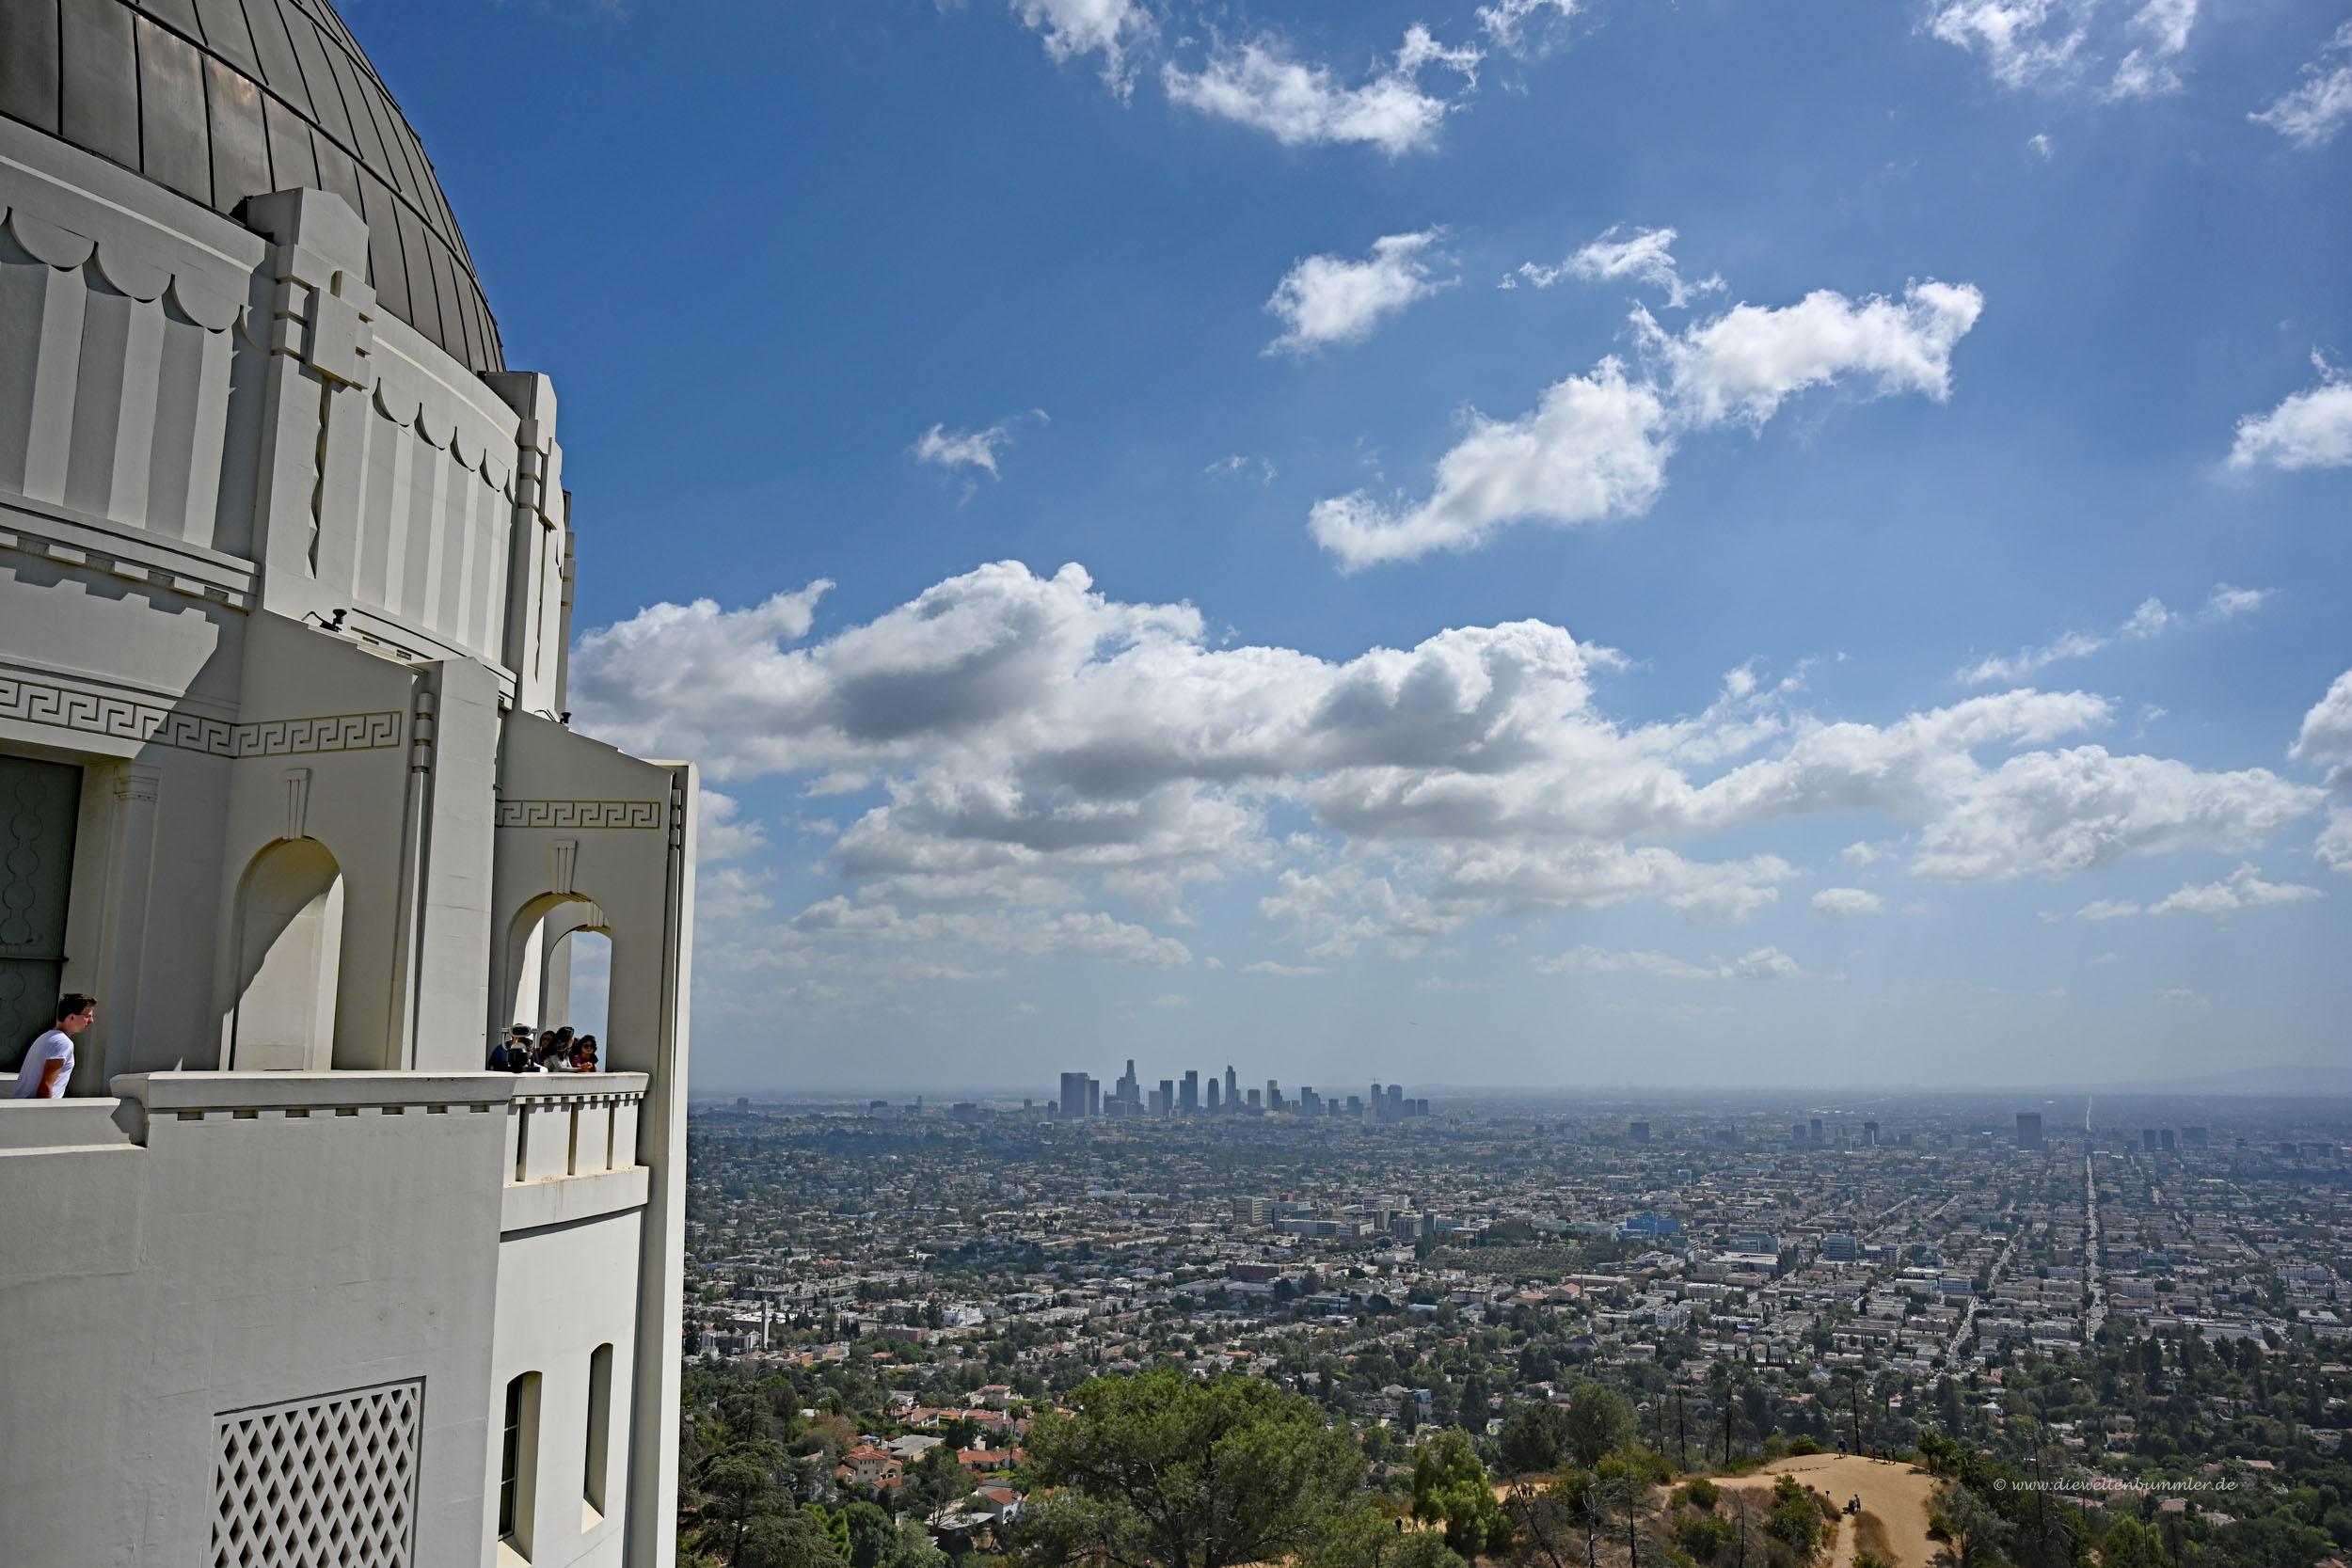 Ausblick vom Observatorium